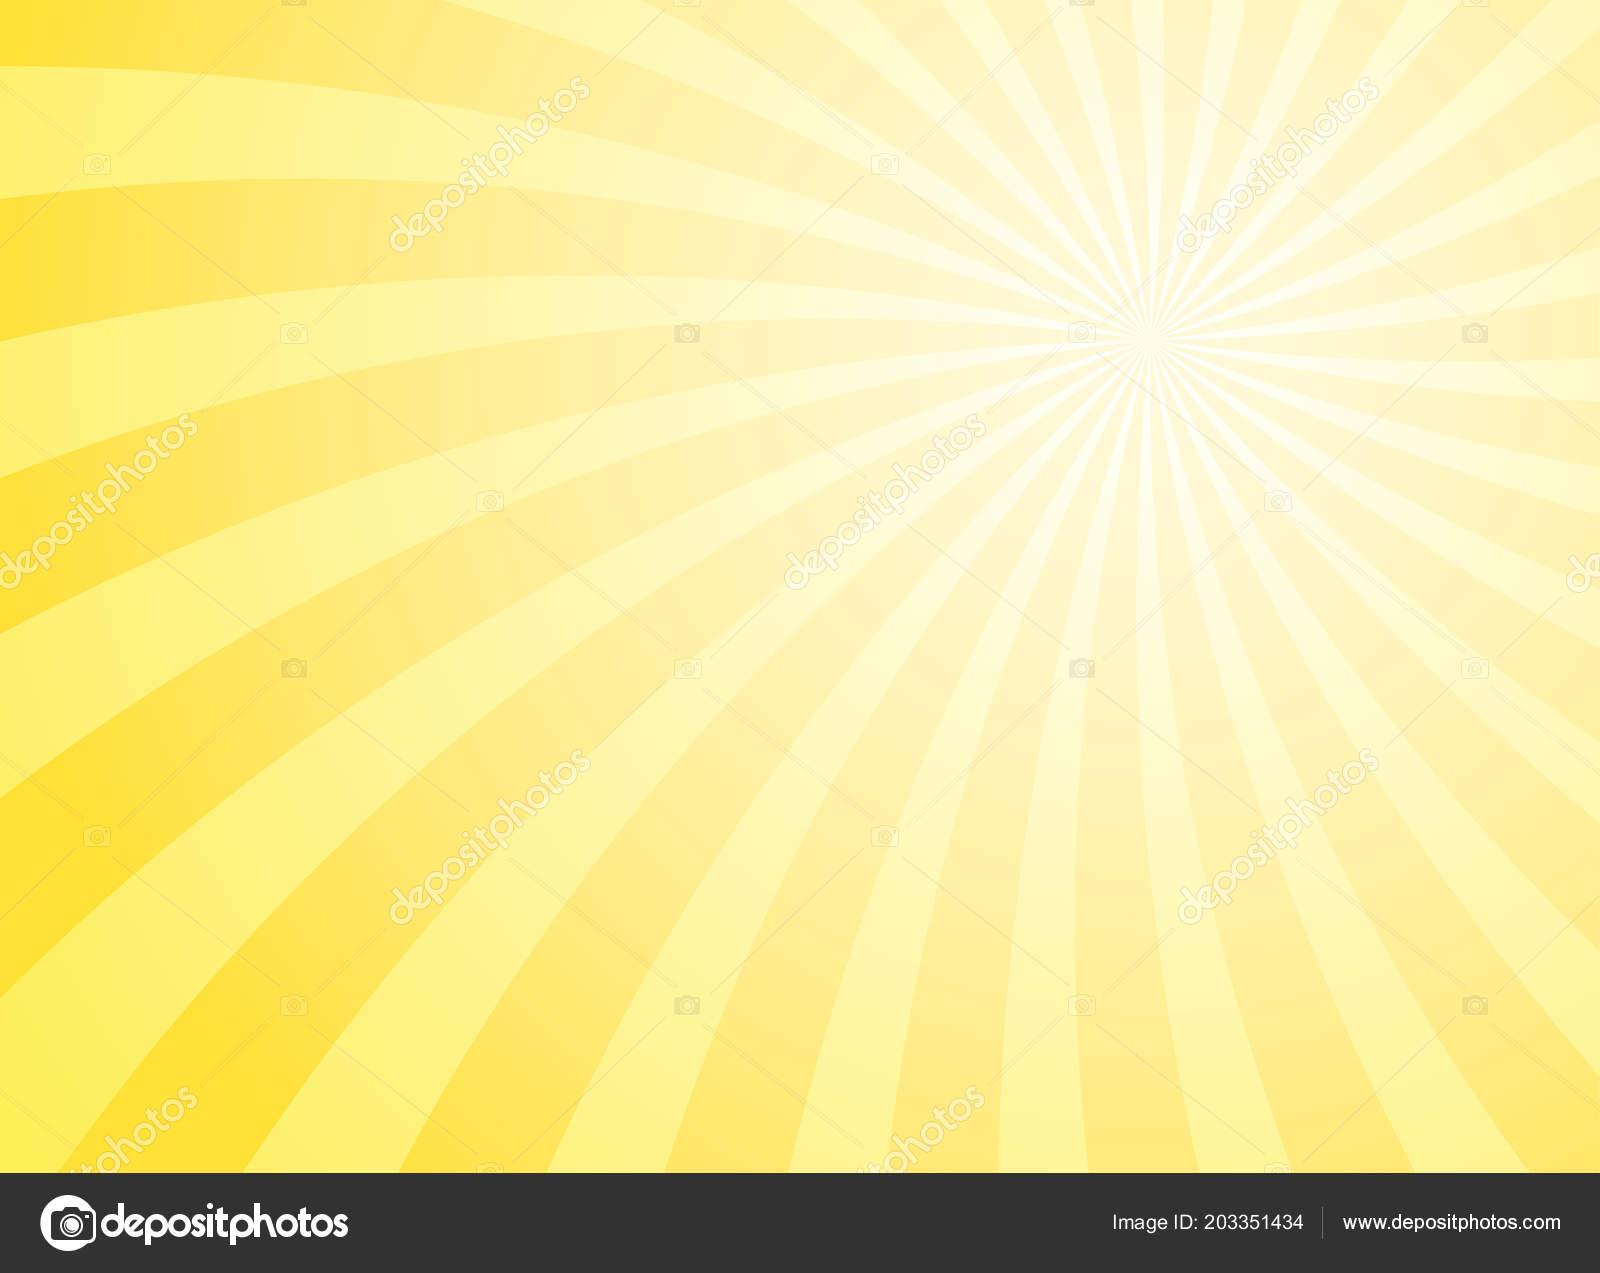 2c42b7e94d938 Summer sunlight background. Bright yellow color burst background. Vector  illustration. Sun beam ray sunburst pattern background. Retro bright  backdrop.